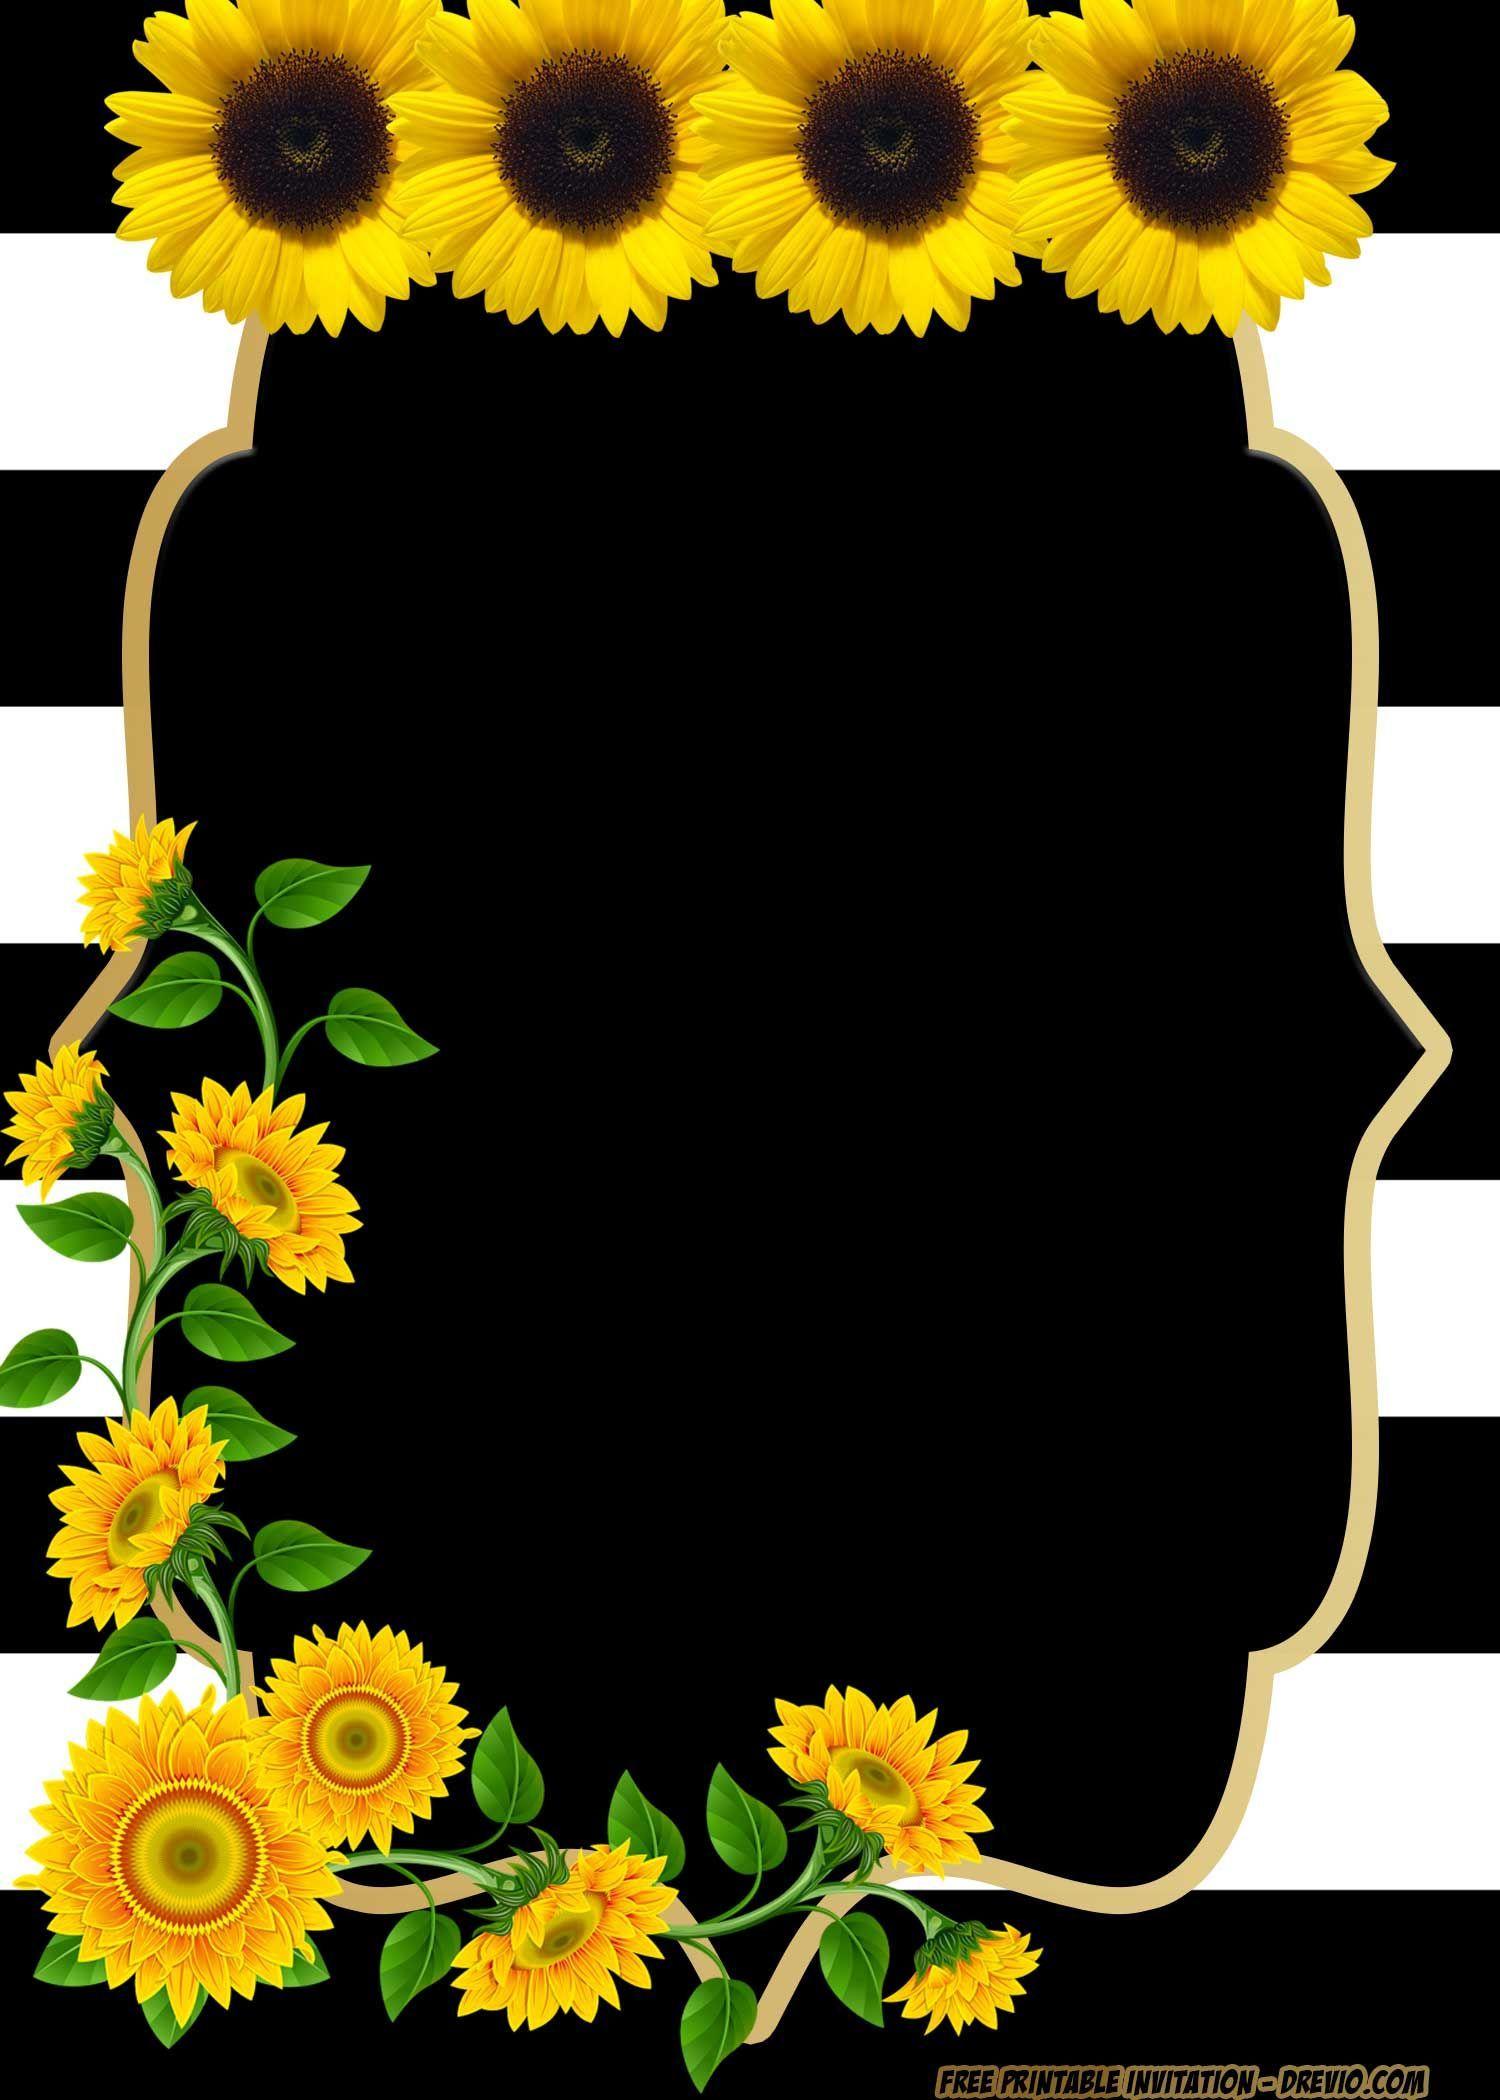 Free Printable Sunflower Birthday Invitation Templates Nice Free Printable Sunflower B In 2020 Sunflower Invitations Flower Baby Shower Invites Sunflower Baby Showers